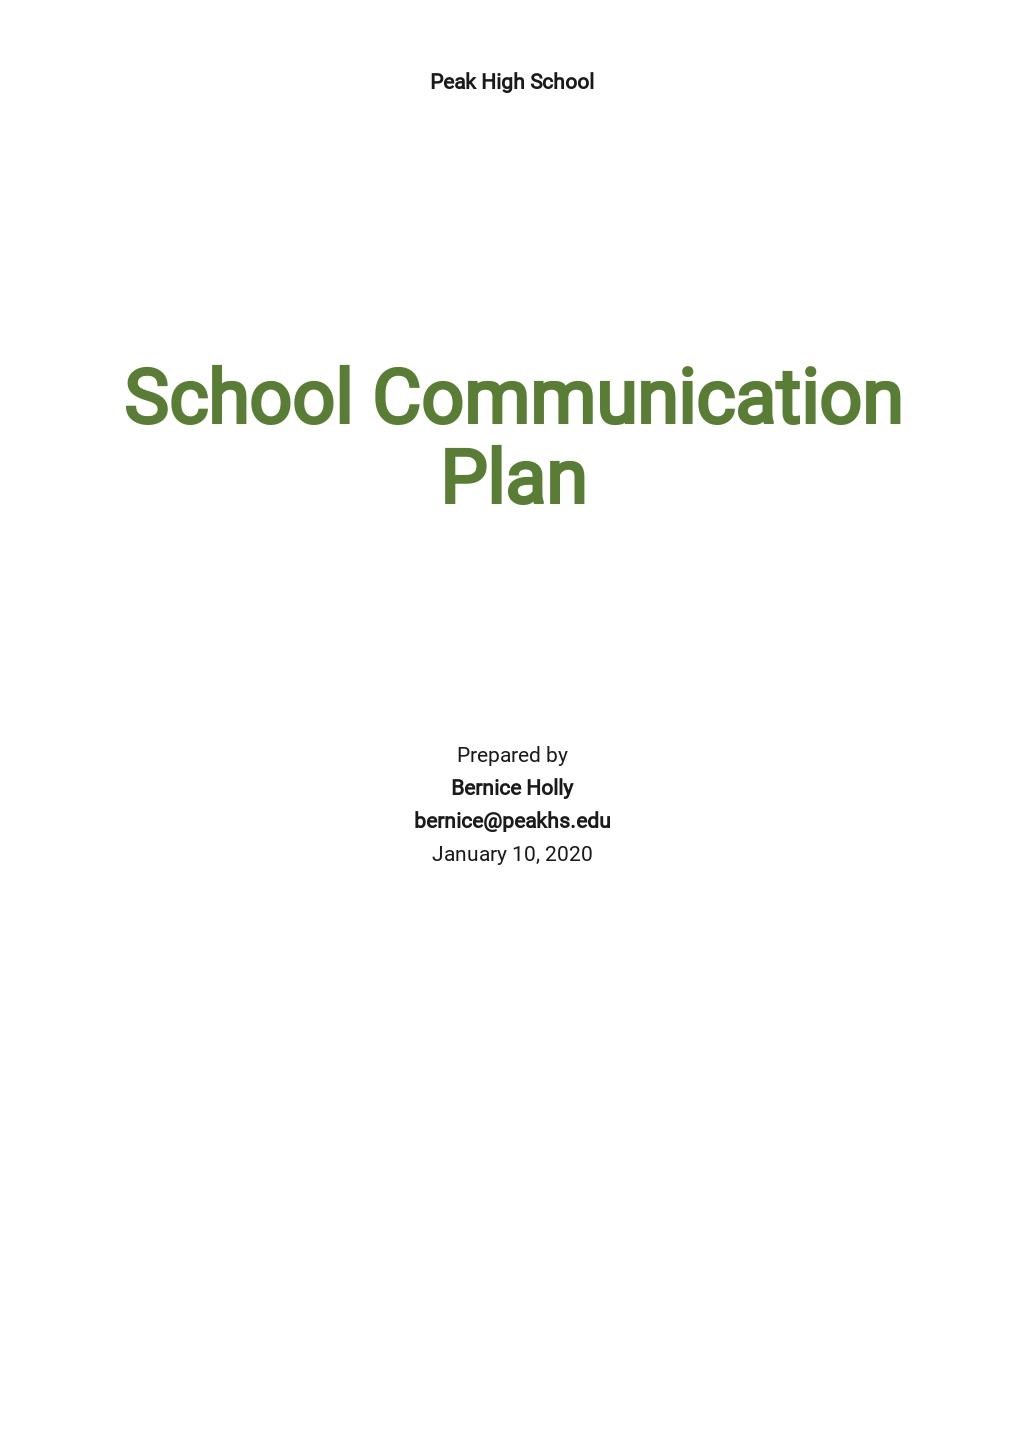 School Communication Plan Template